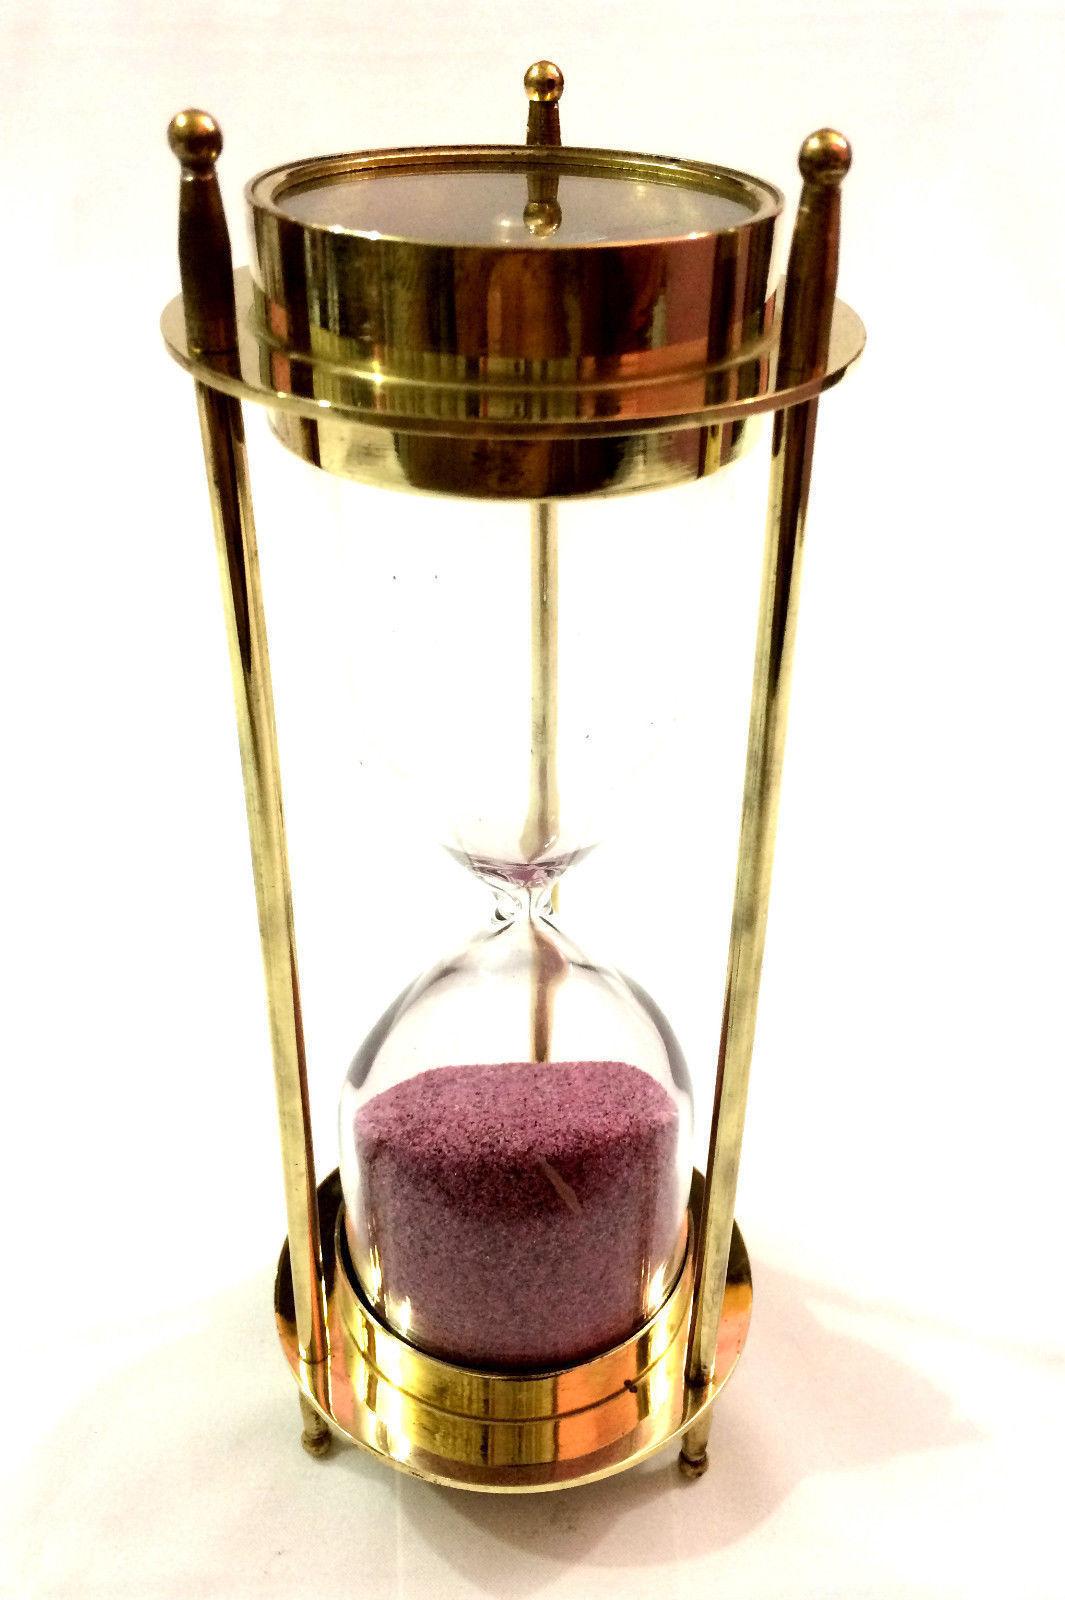 Brass Nautical Compass Hourglass Antique Sand Timer